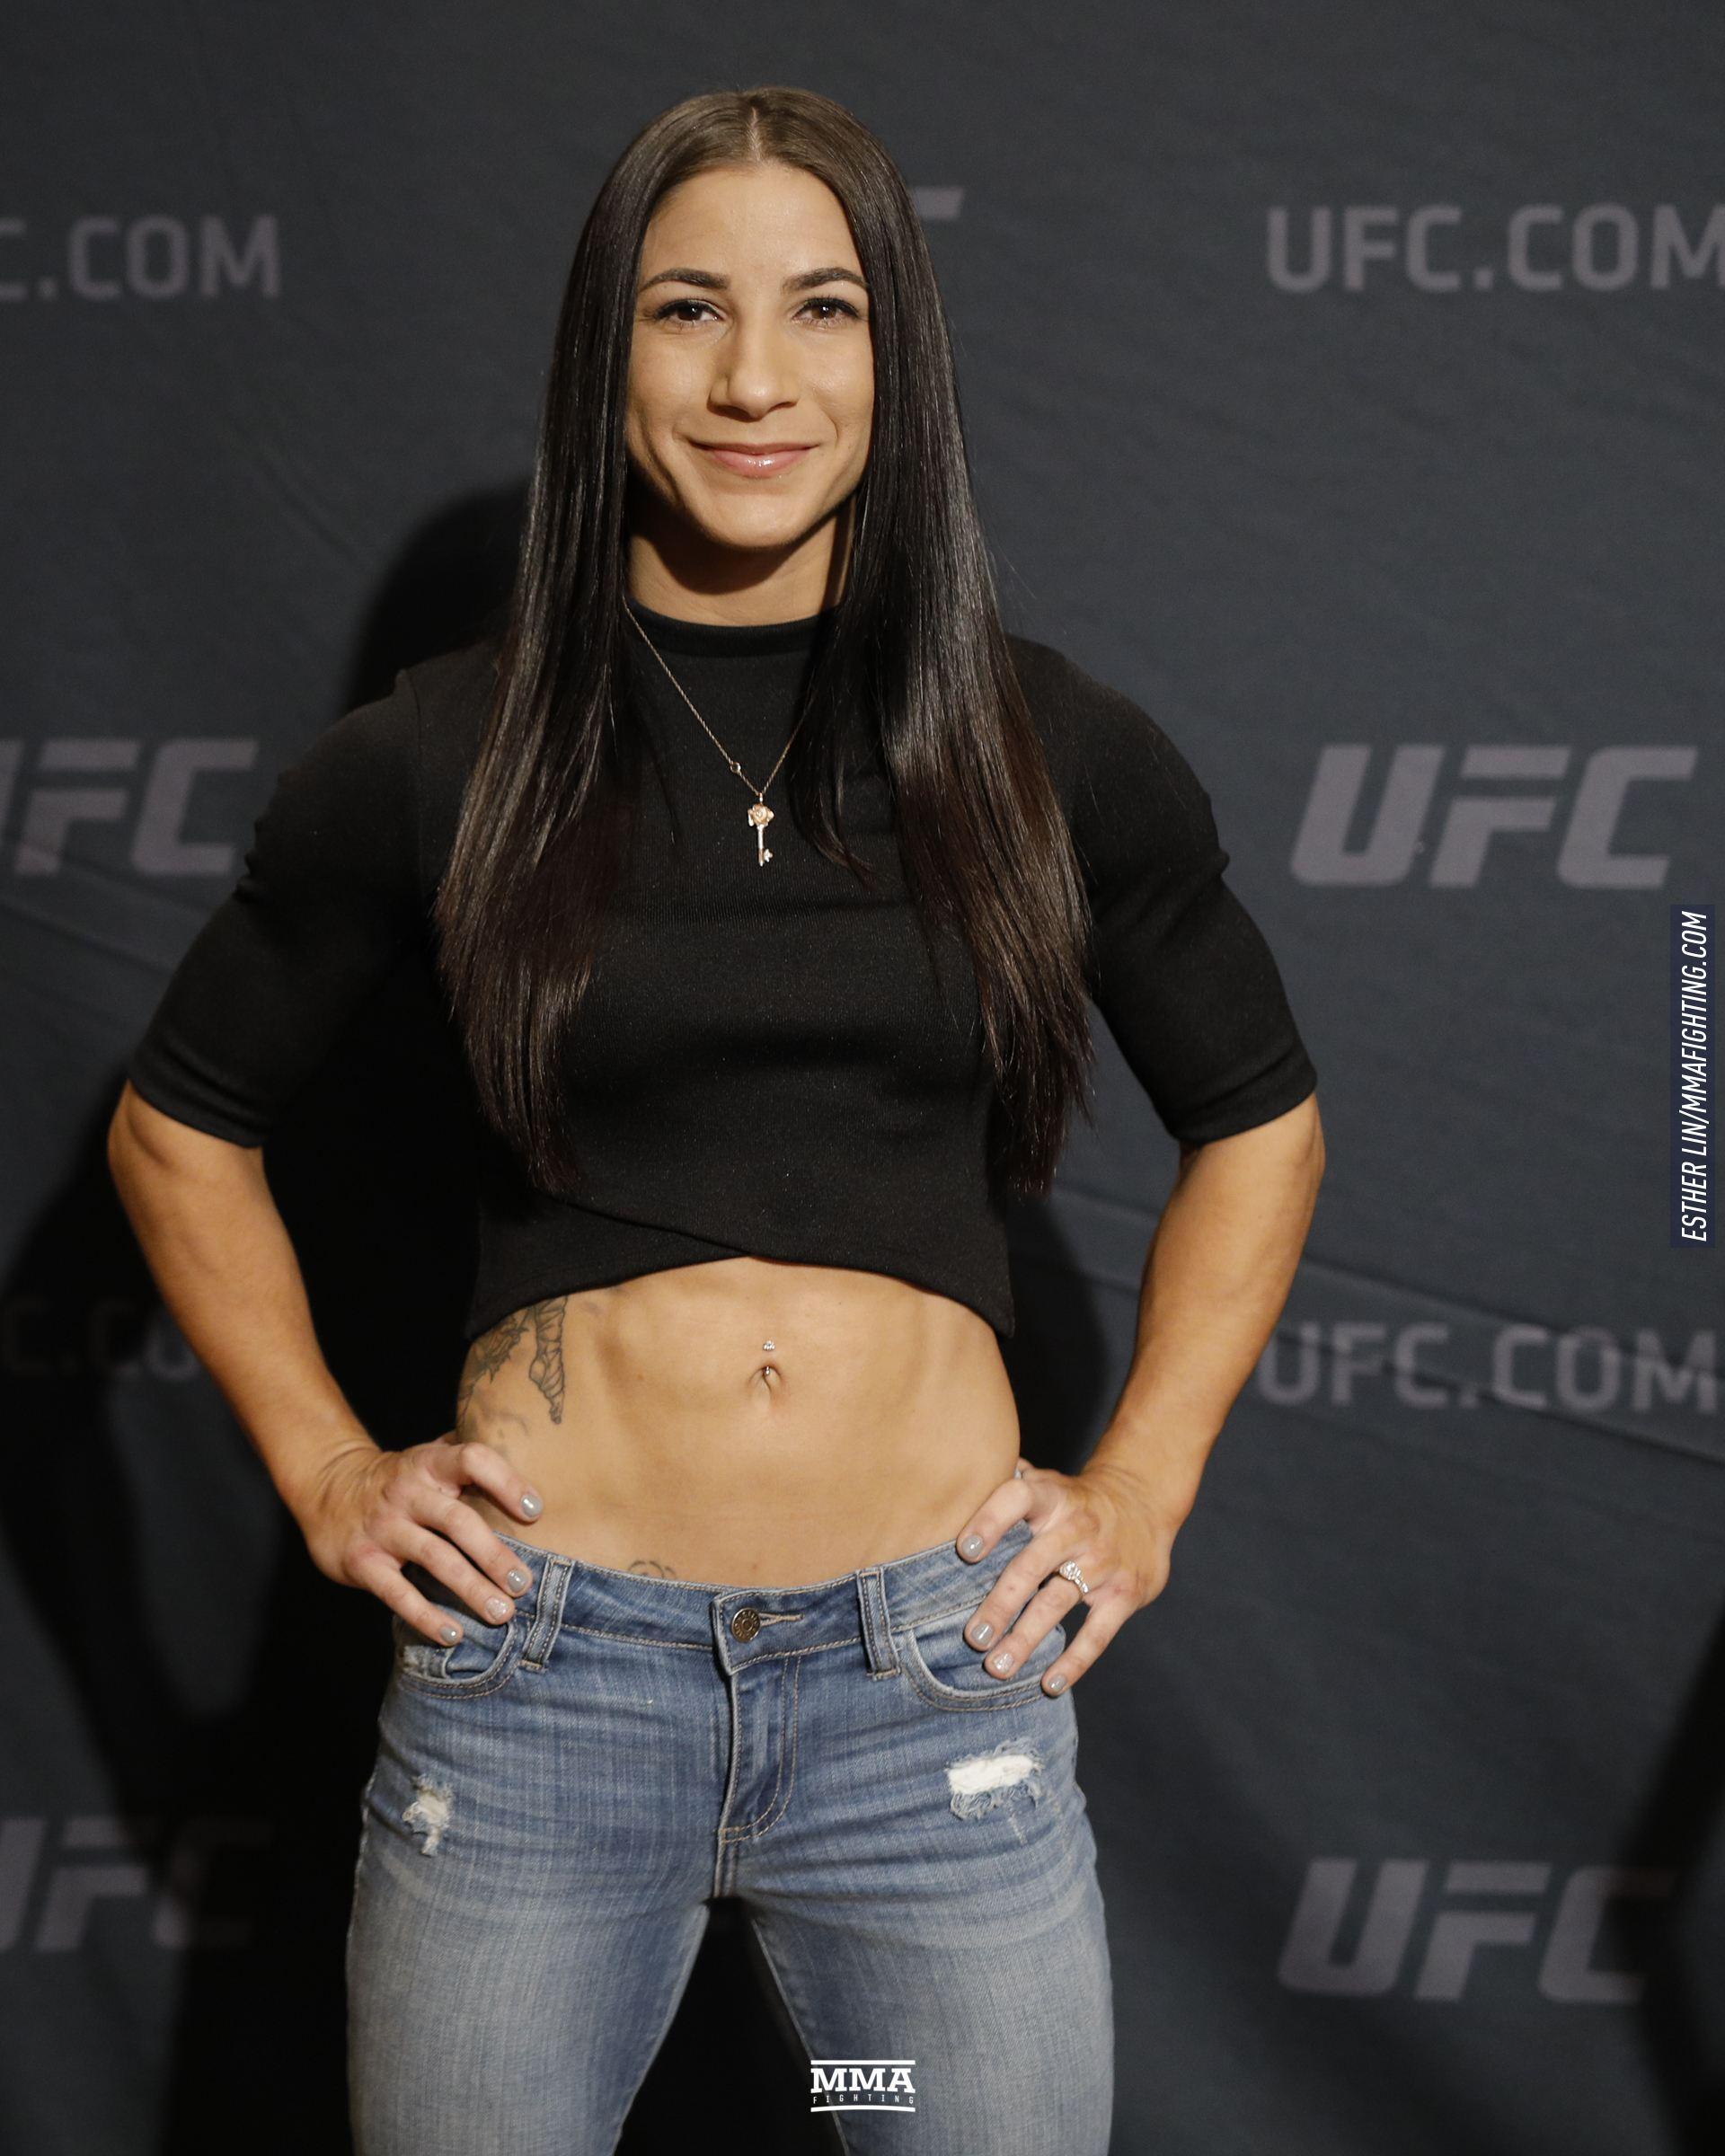 UFC 218 media day photos